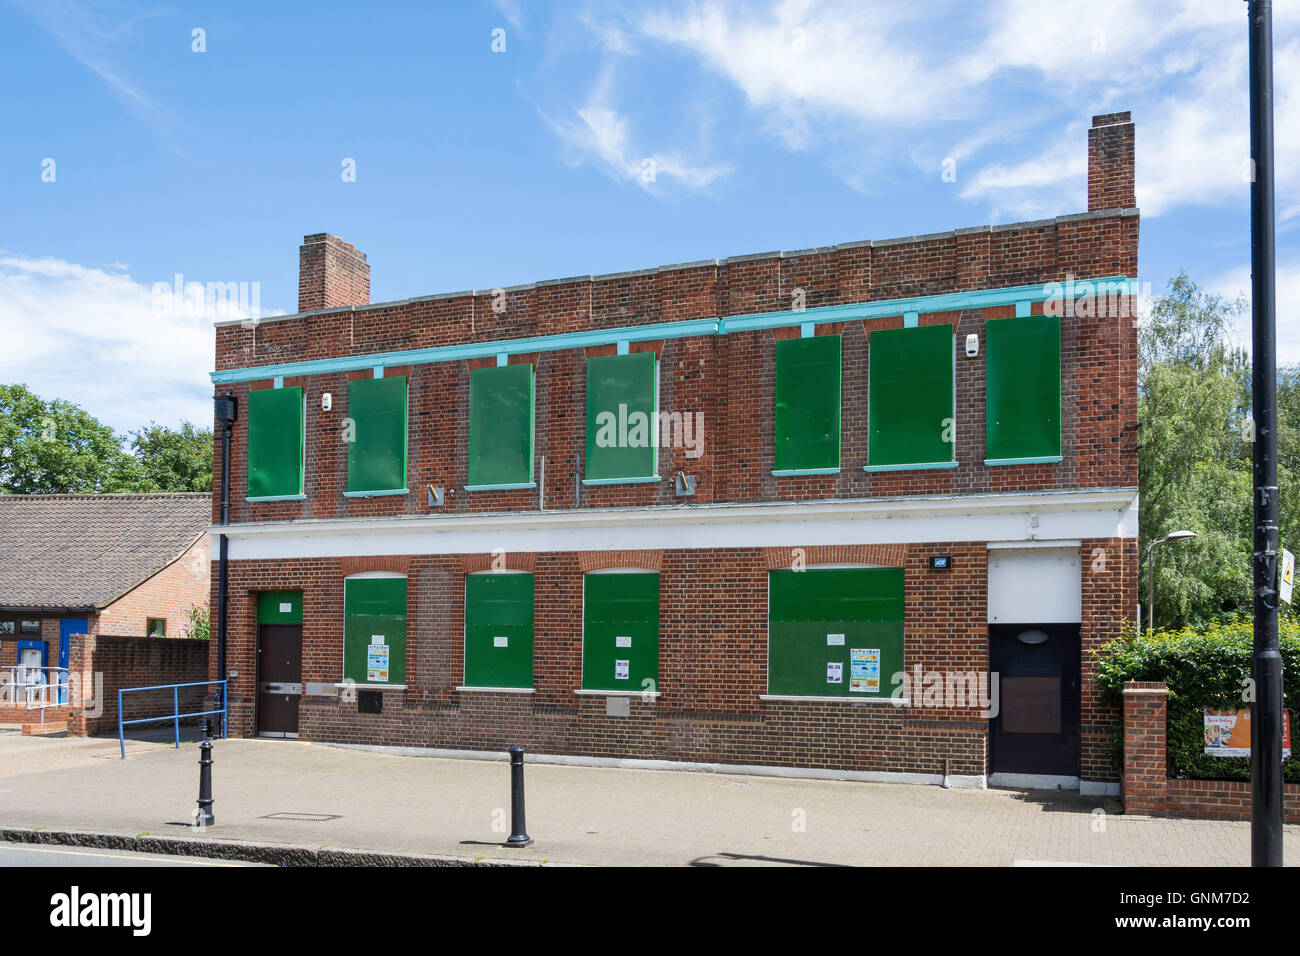 Secured empty property, Shepperton High Street, Shepperton, Surrey, England, United Kingdom - Stock Image